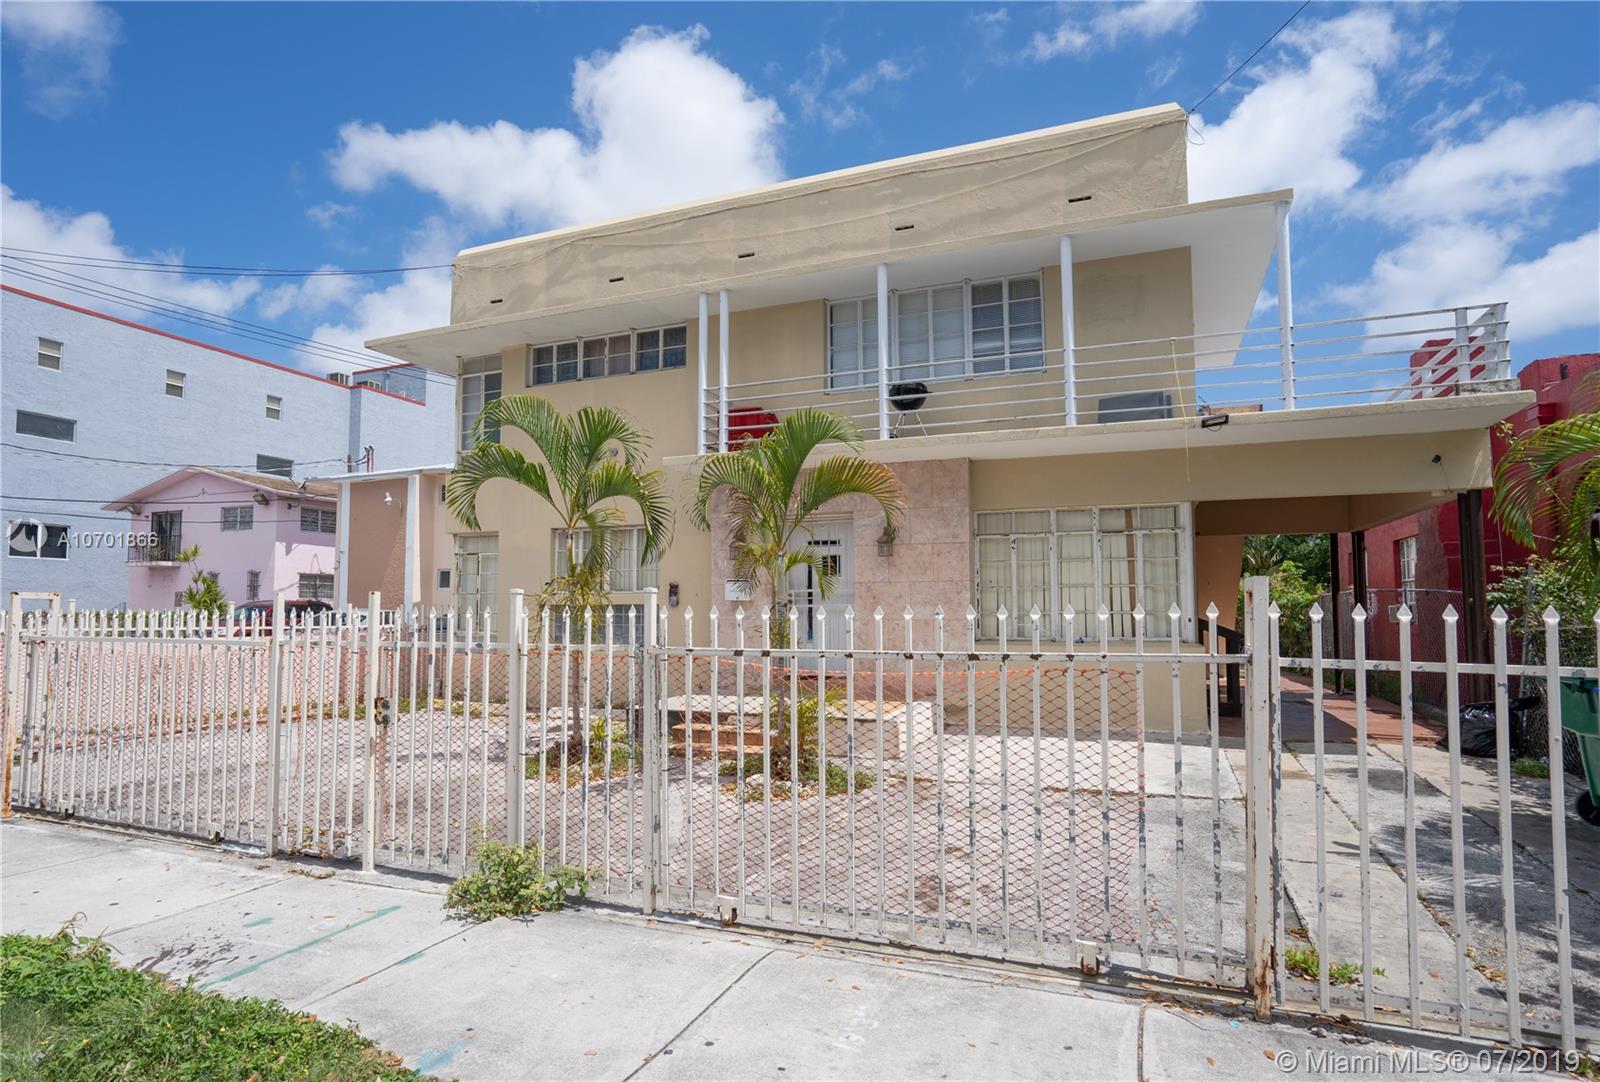 843 NW 3rd ST, Miami, FL 33128